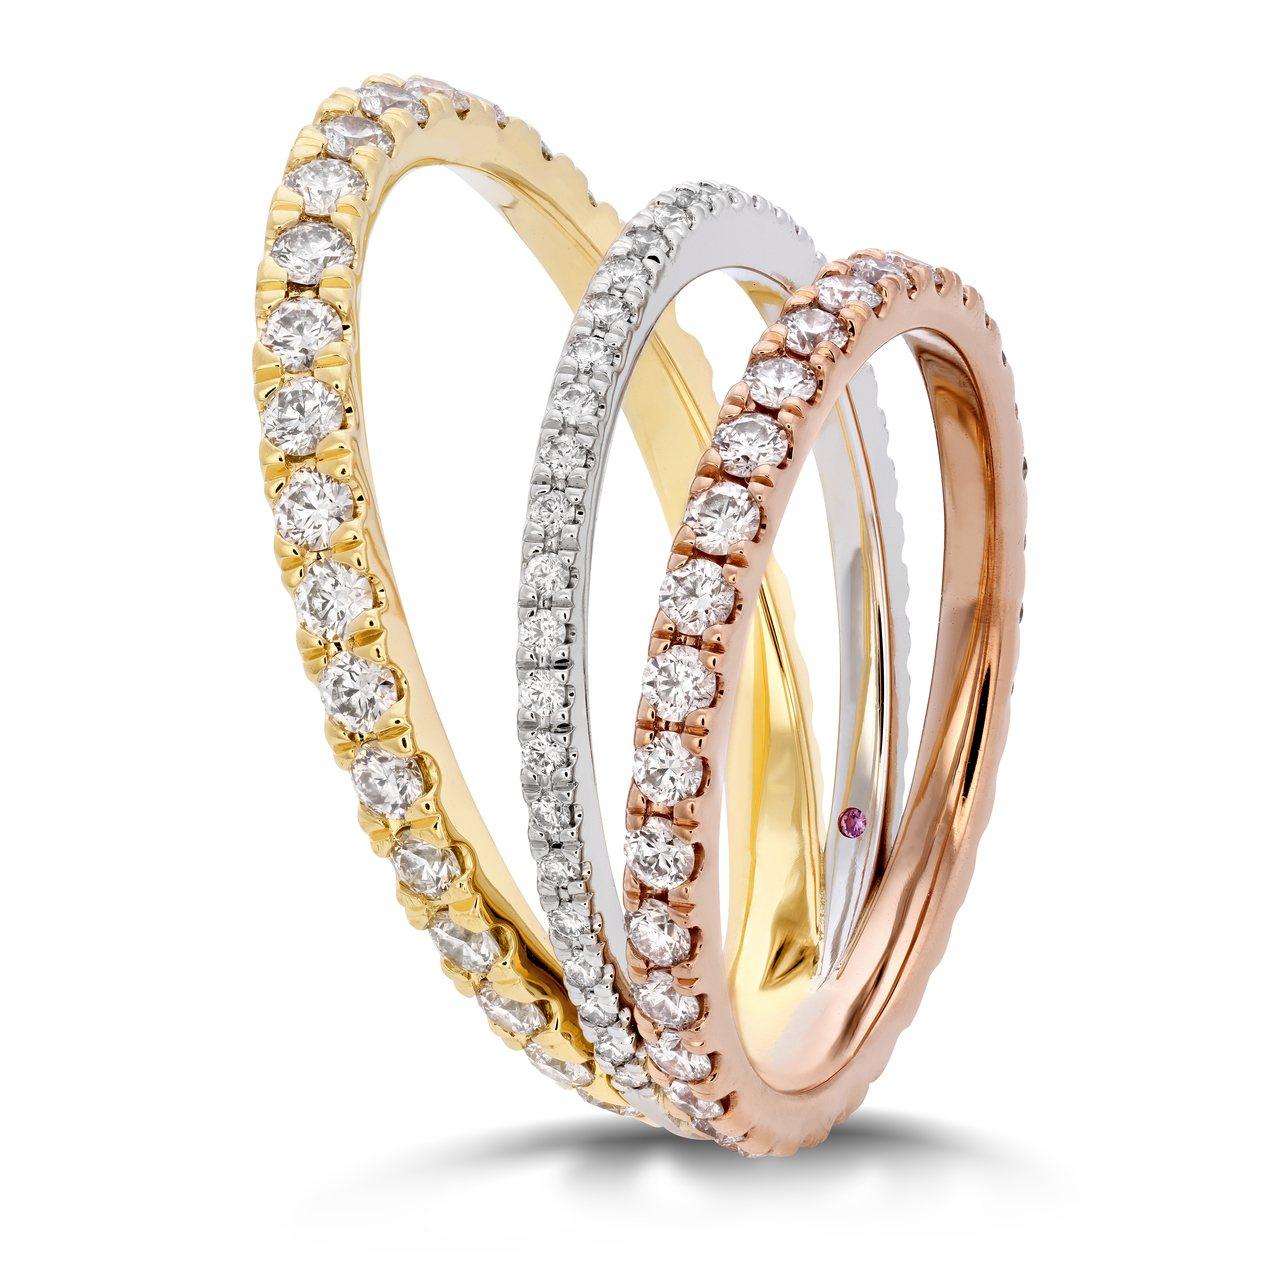 RING THE DRAMA戒指,鉑金、玫瑰金、黃 K 金鑲嵌鑽石及粉紅剛玉,2...